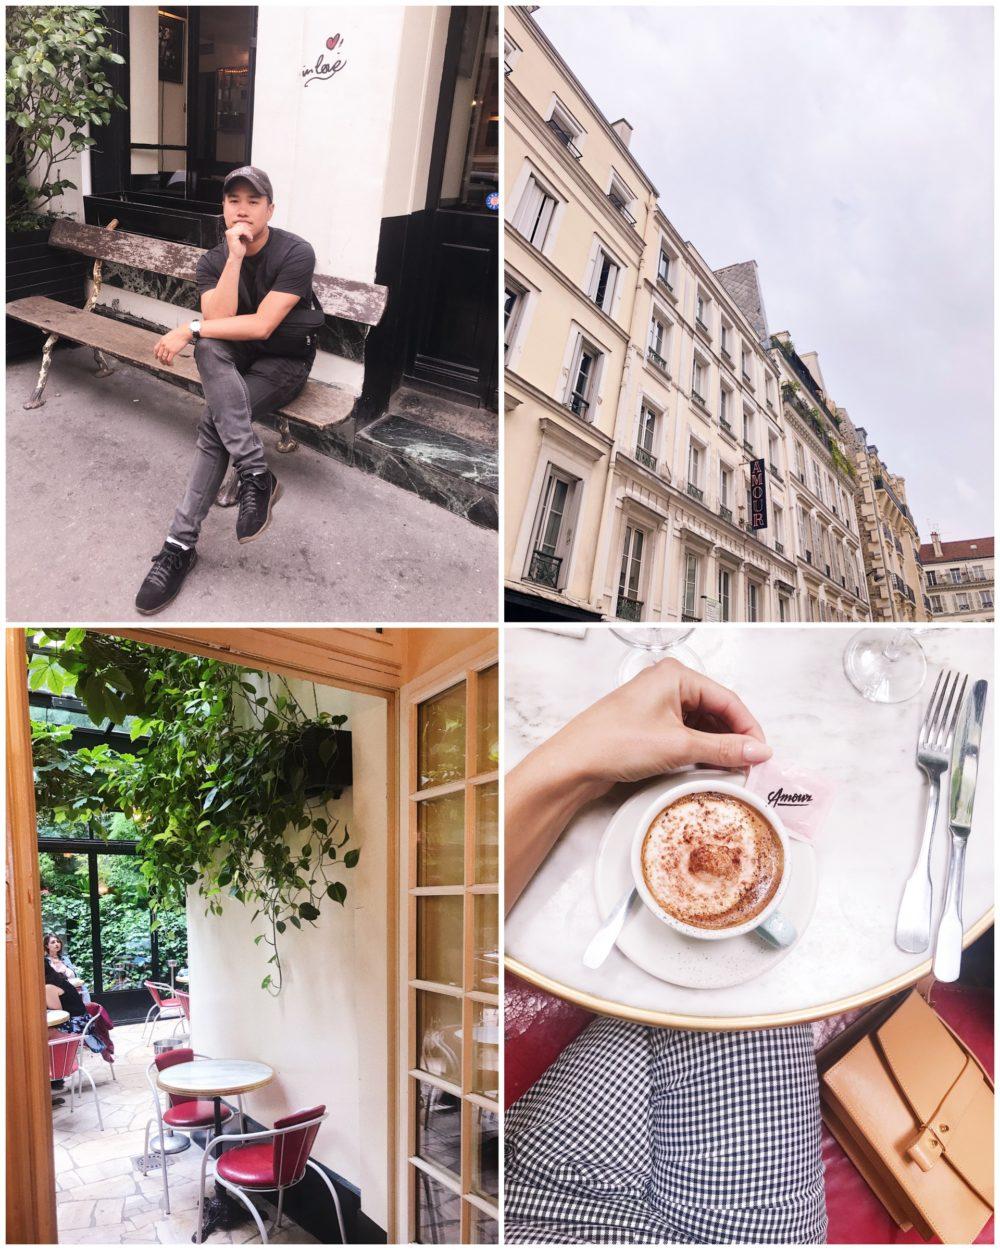 Paris-France-Amour-Hotel-e1530910191956.jpg